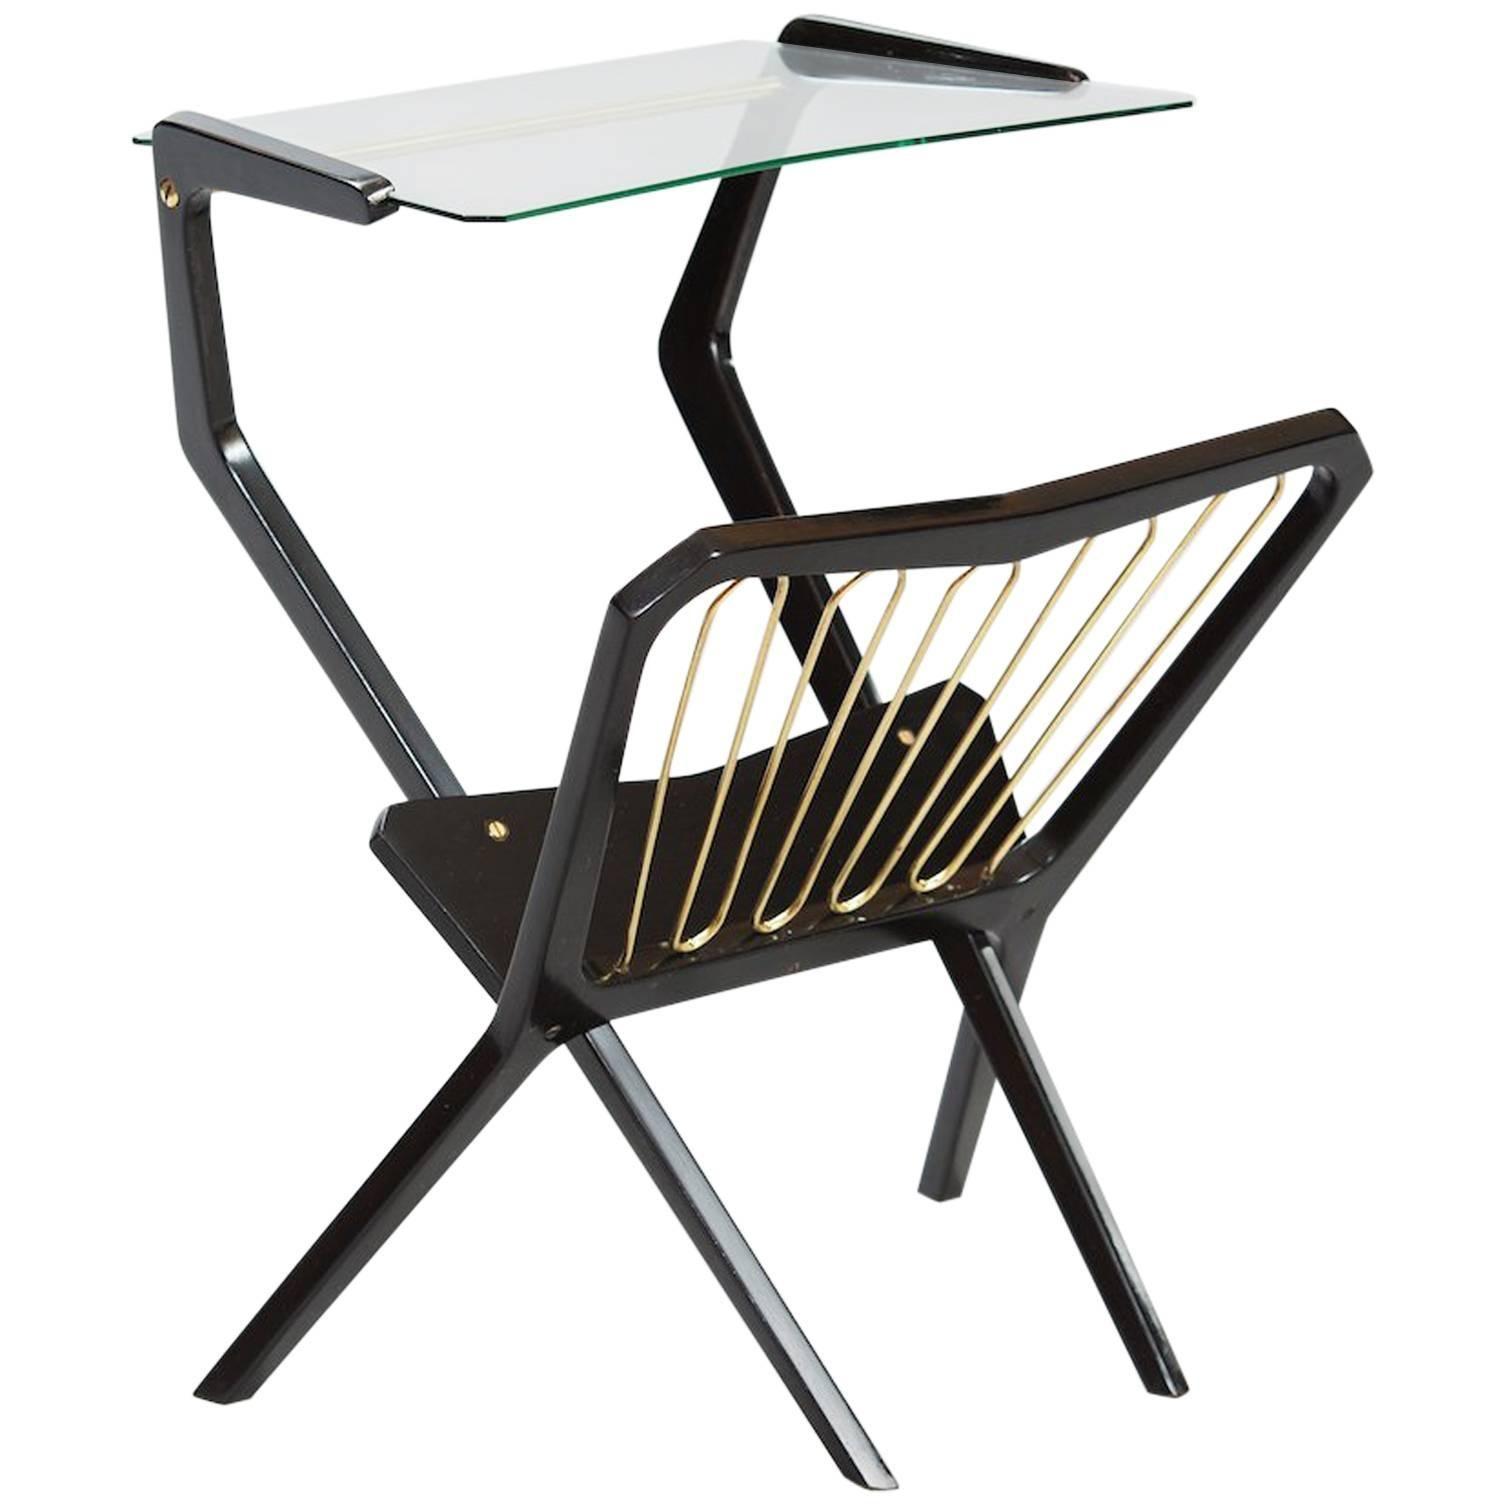 Italian Table with Magazine Rack